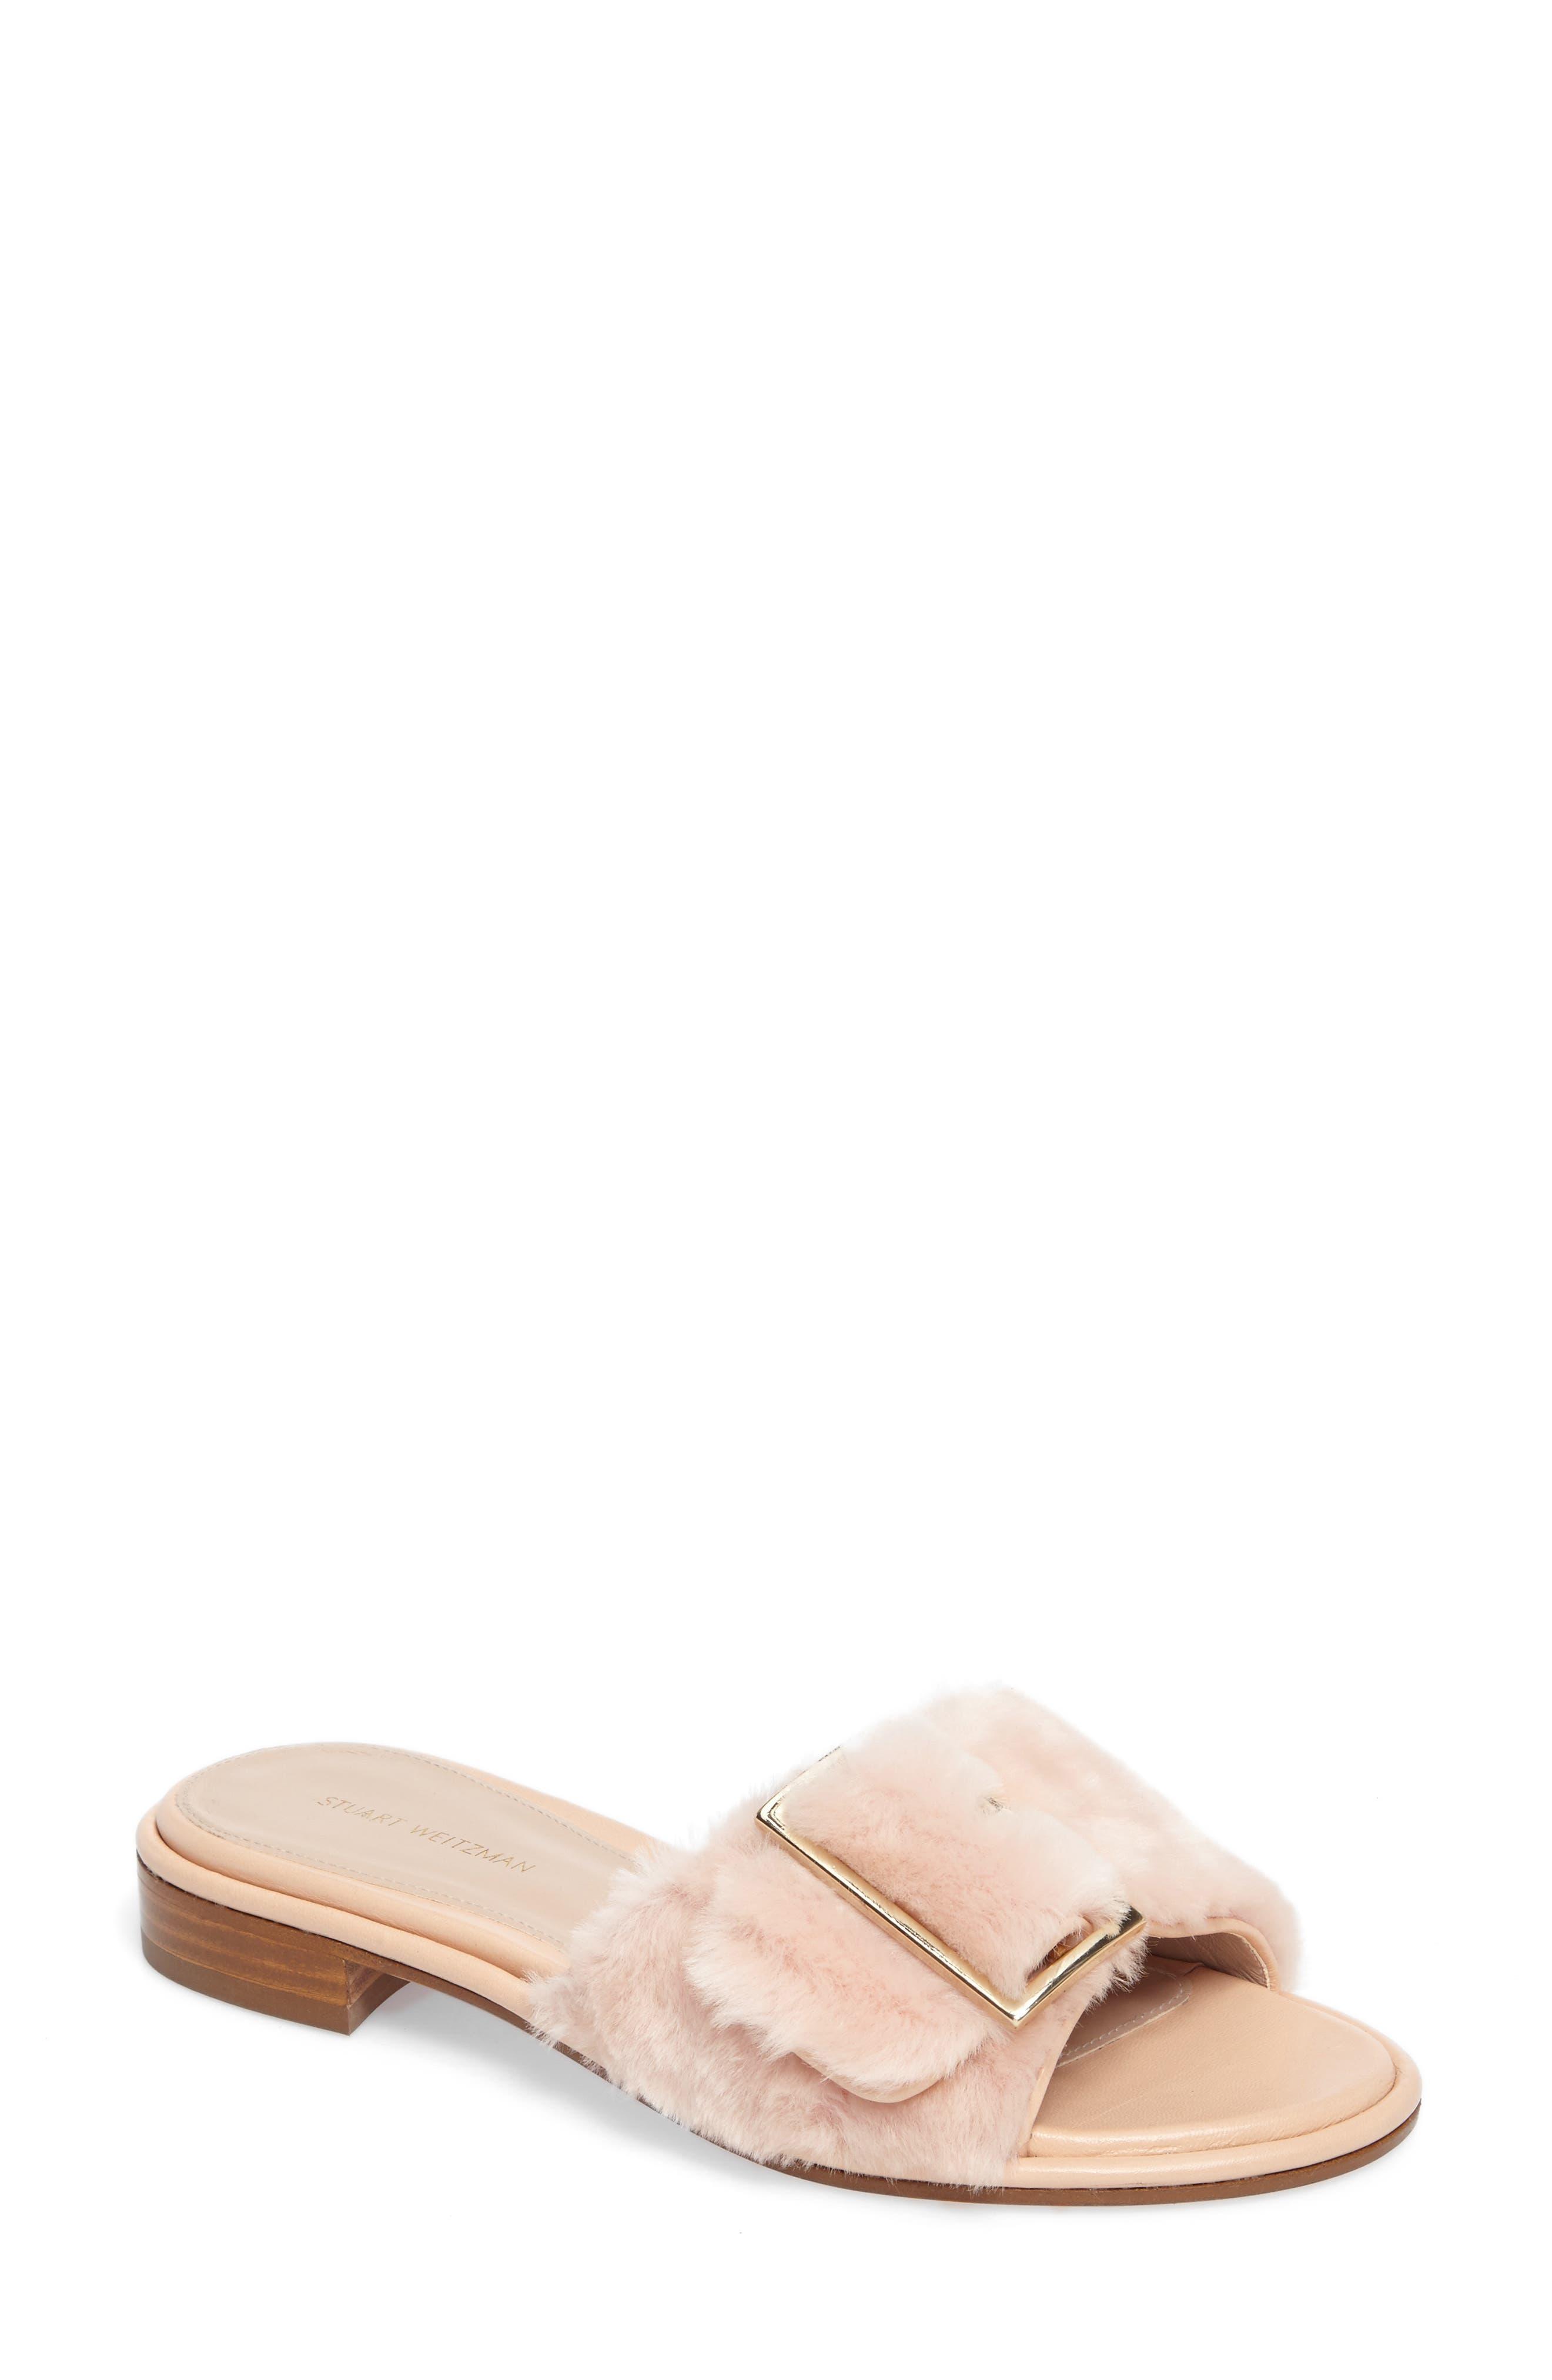 Fuzzywuz Genuine Shearling Slide Sandal,                             Main thumbnail 1, color,                             270